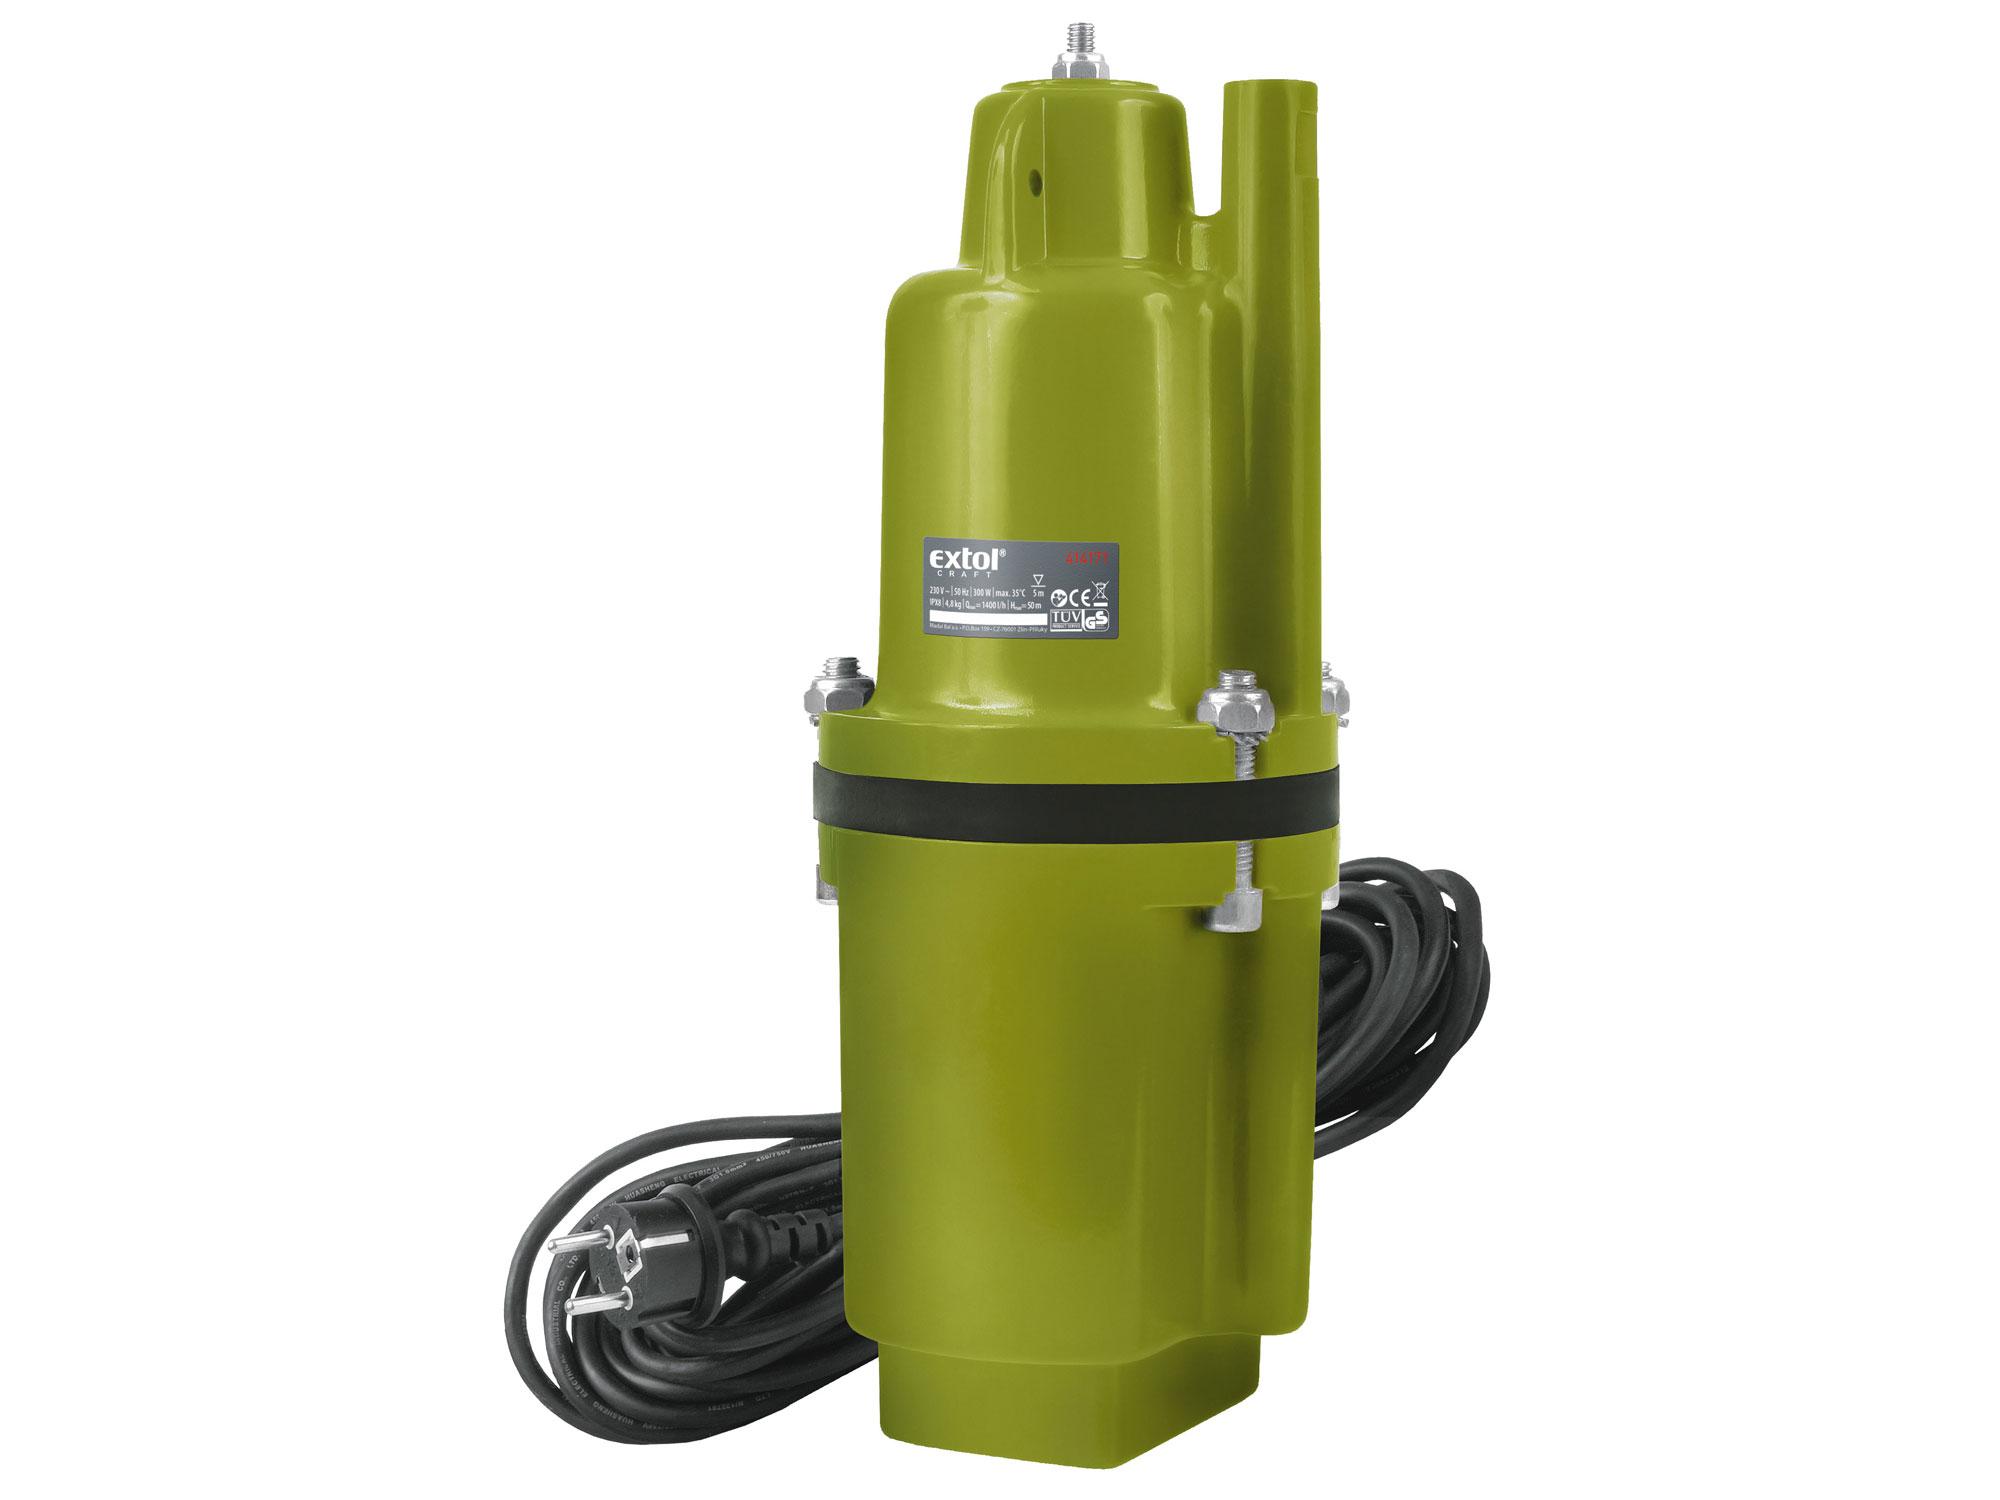 Čerpadlo membránové hlubinné ponorné 414171 EXTOL CRAFT